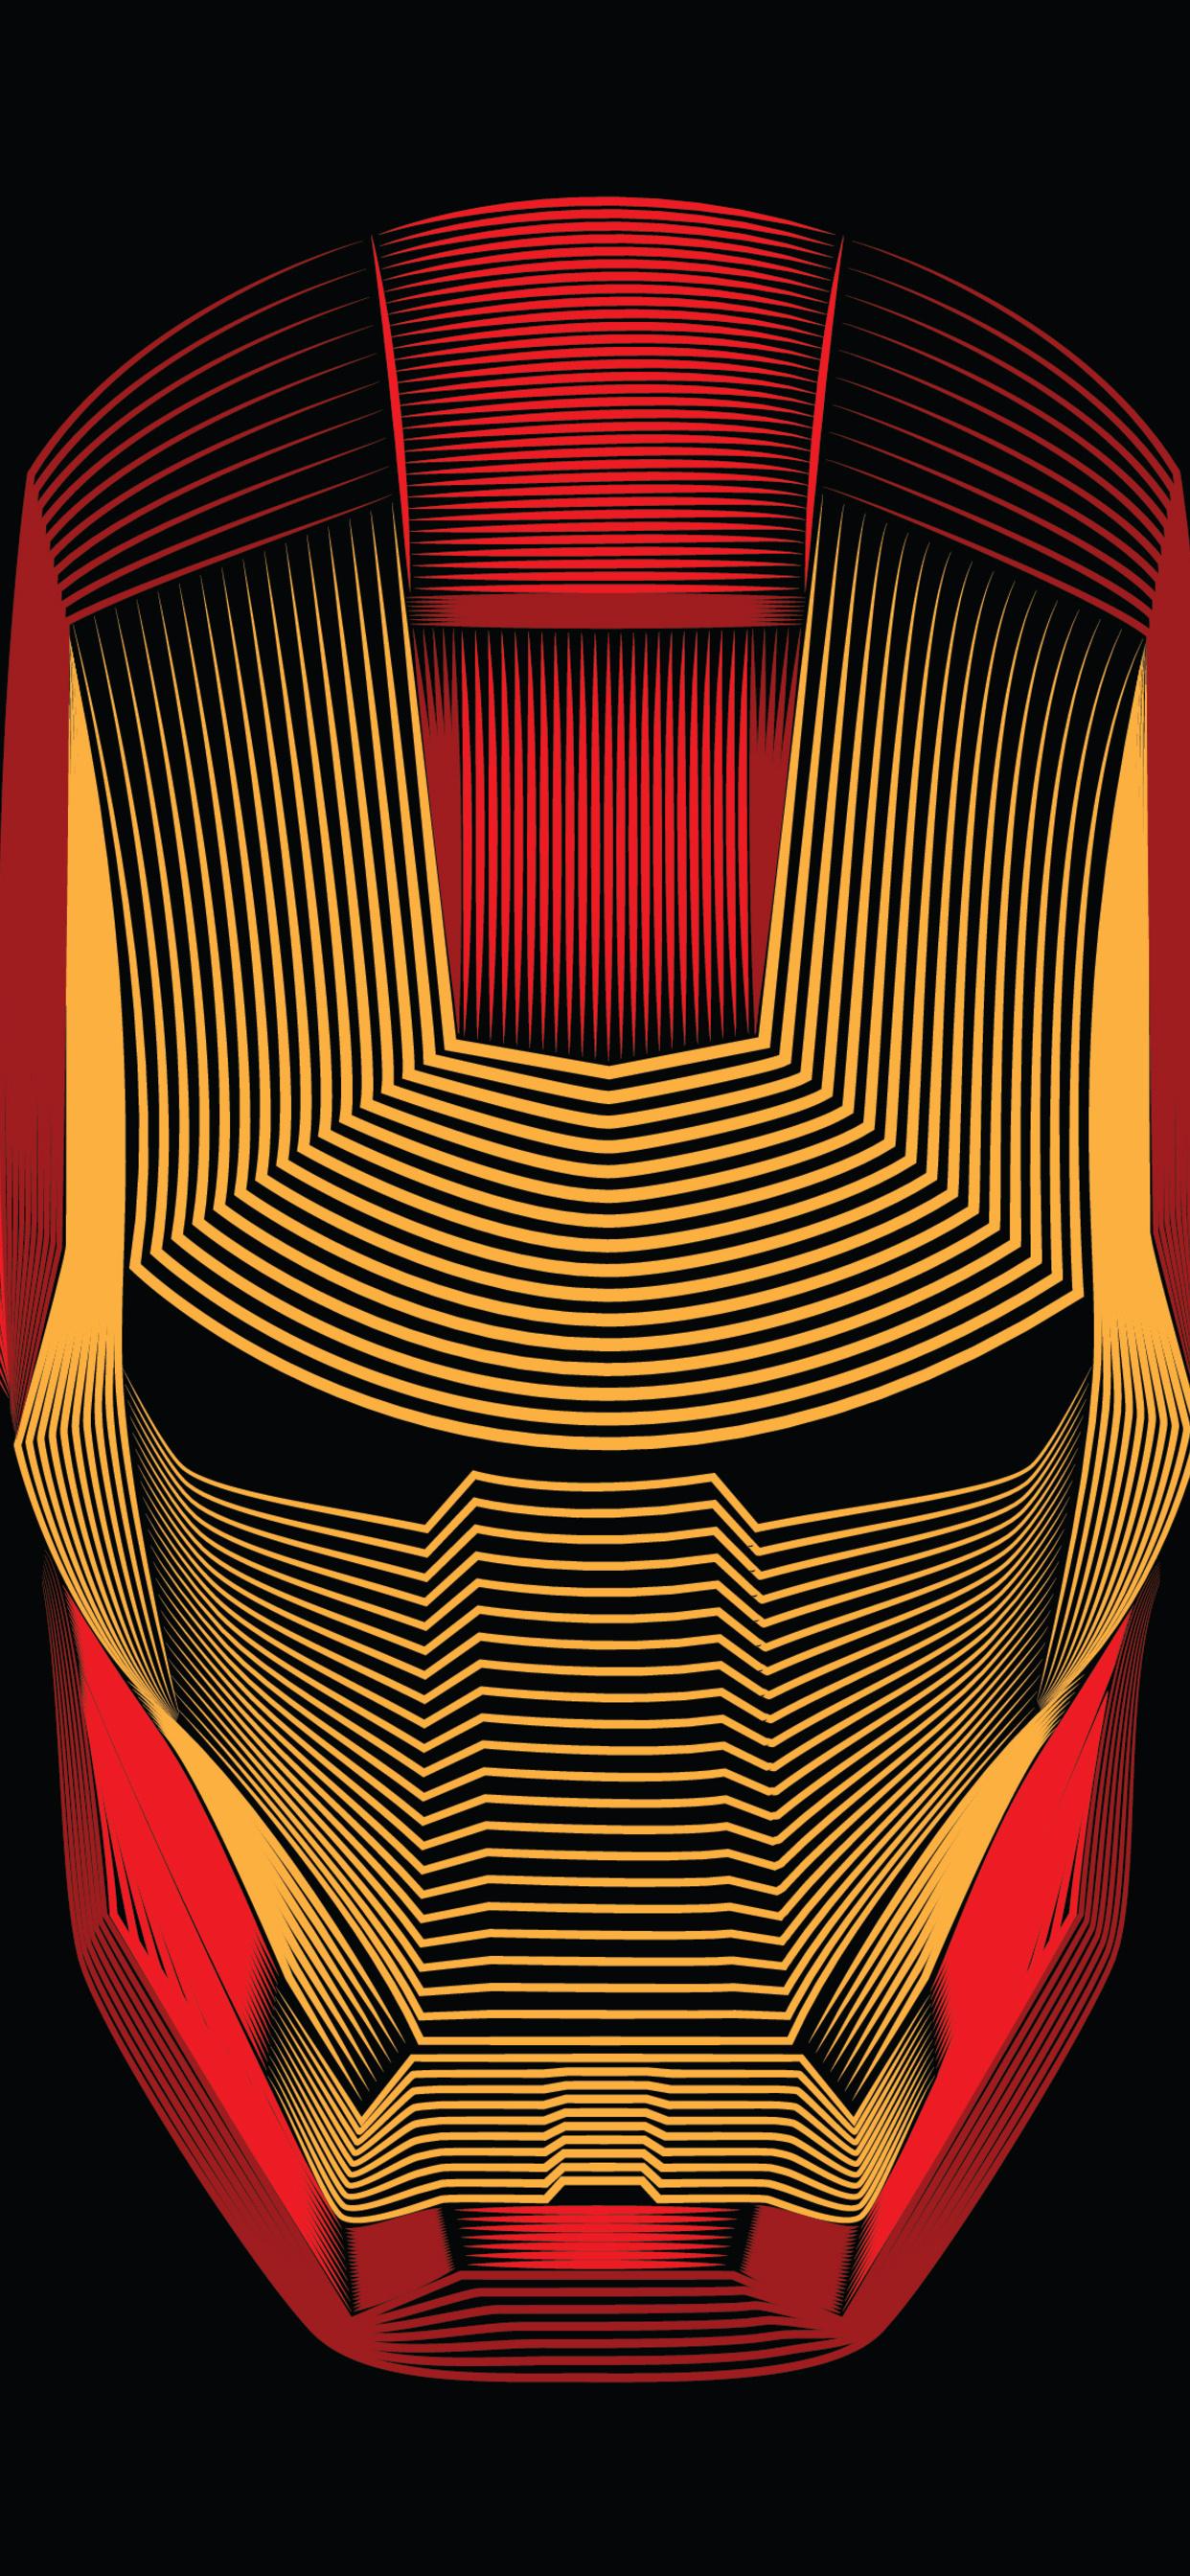 new-iron-mask-minimalist-ig.jpg